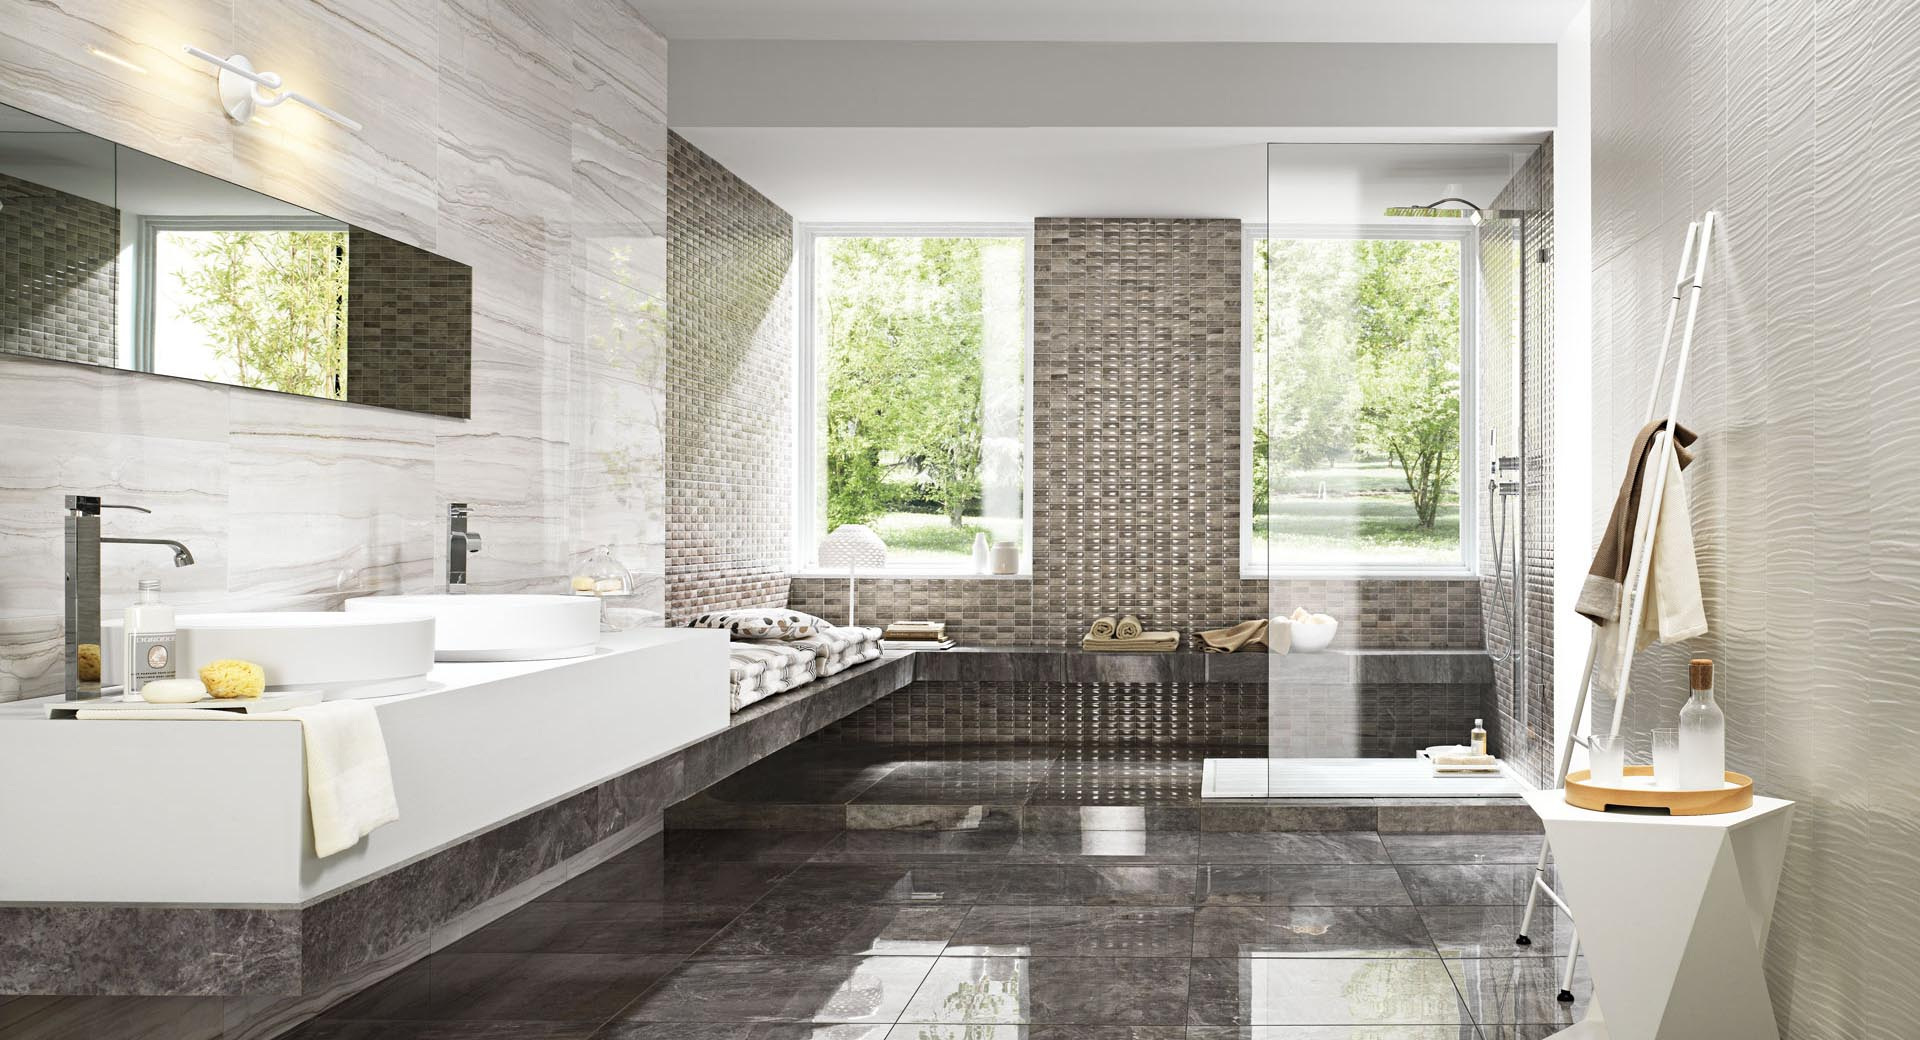 arredamento bagno cuneo arredi per bagni cuneo arredo bagno di design a cuneo arredi classici per il bagno cuneo